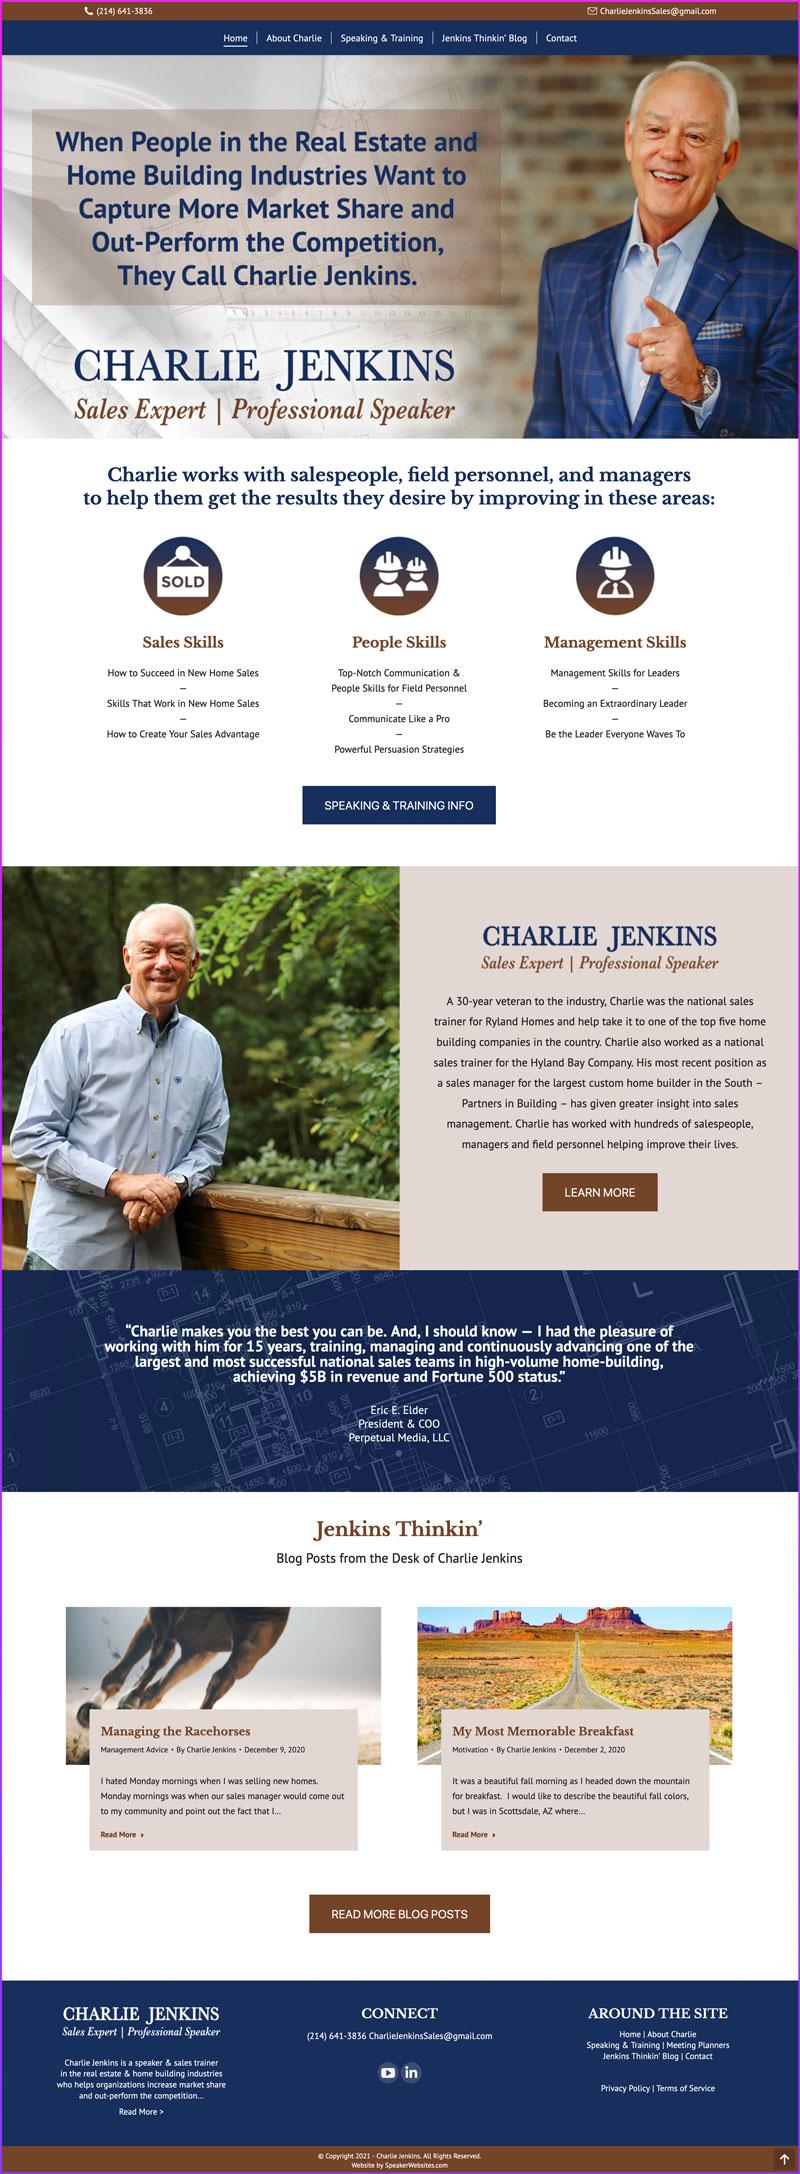 Charlie Jenkins - Sales Expert & Professional Speaker